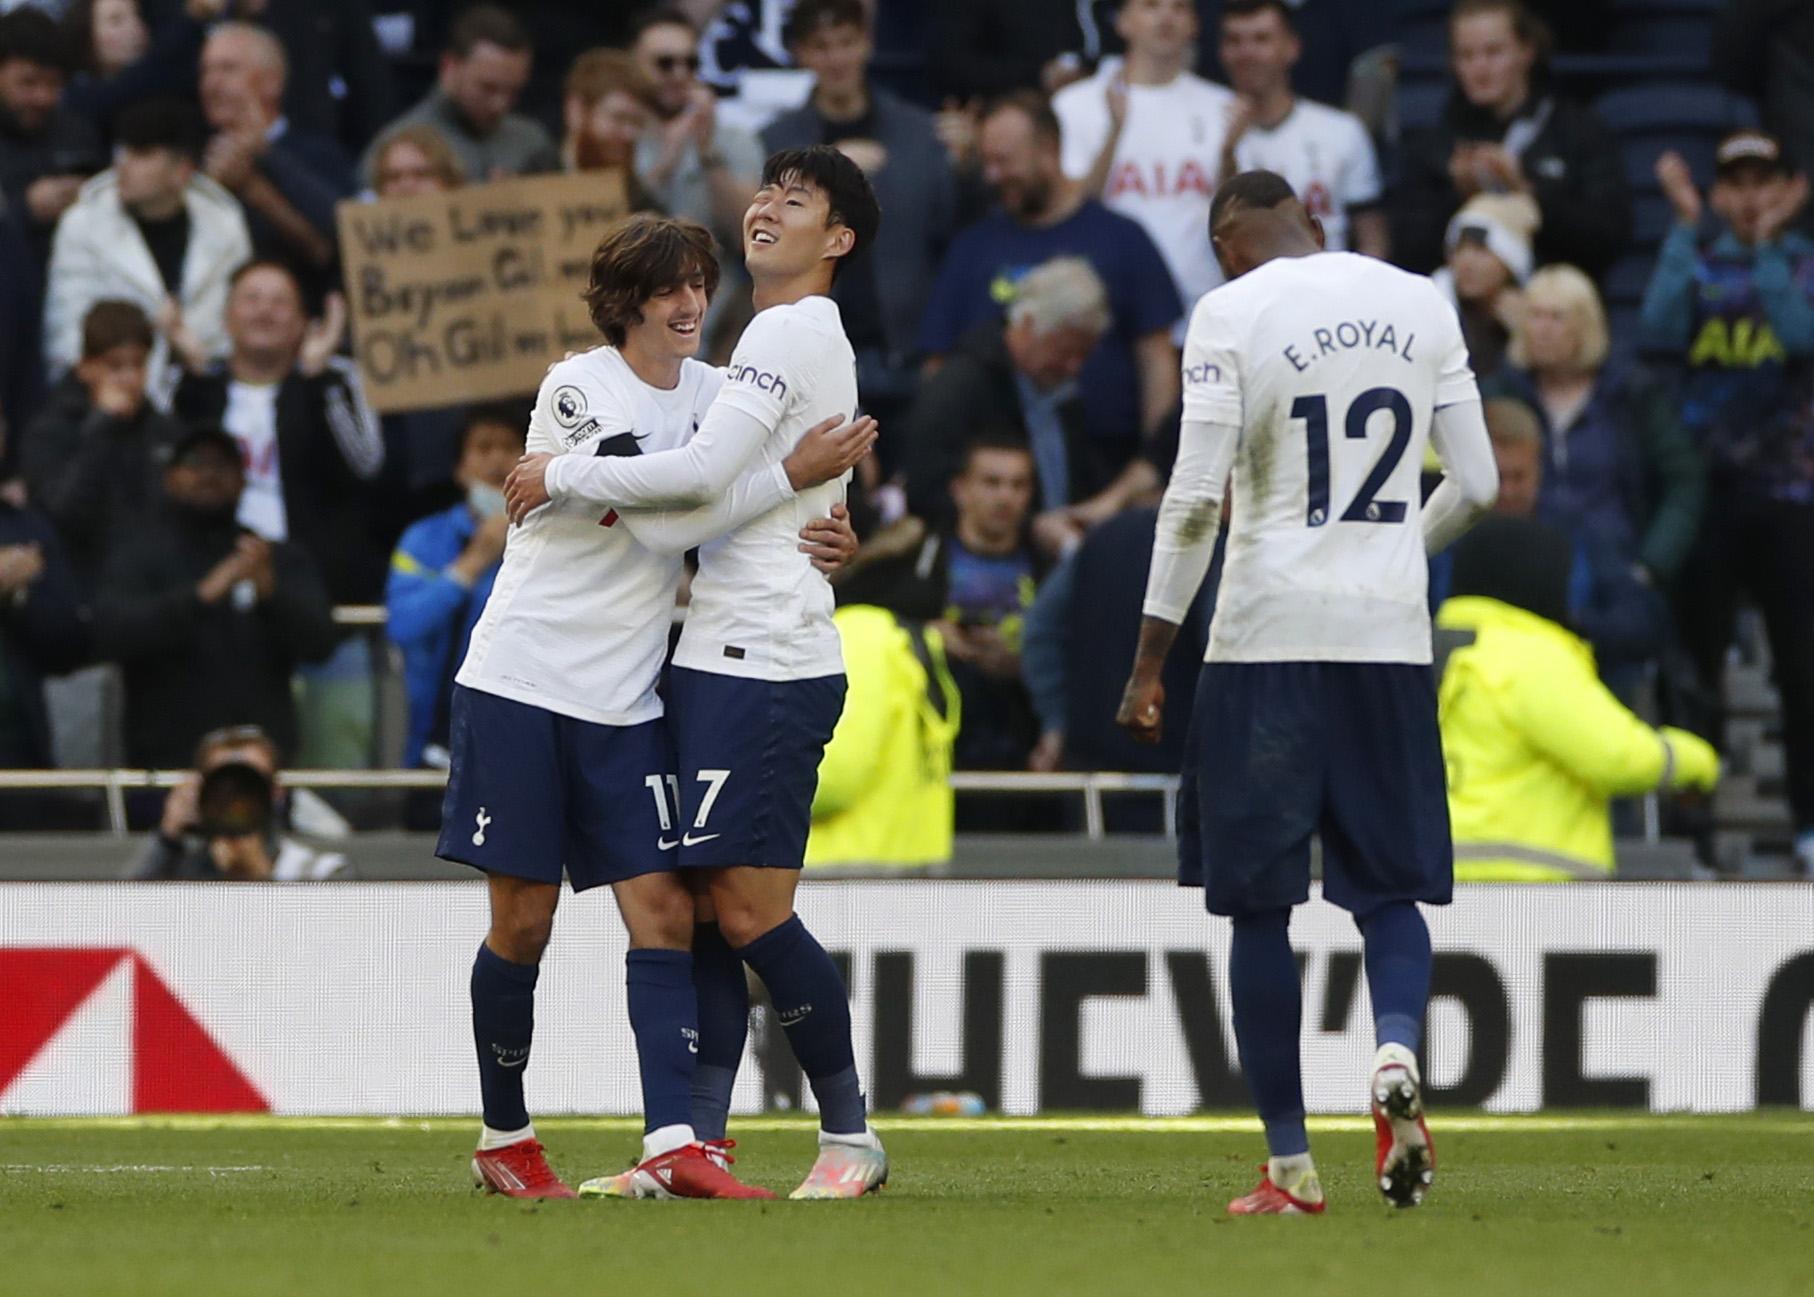 Premier League, Τότεναμ – Άστον Βίλα 2-1: Δυσκολεύτηκε αλλά επέστρεψε στις νίκες